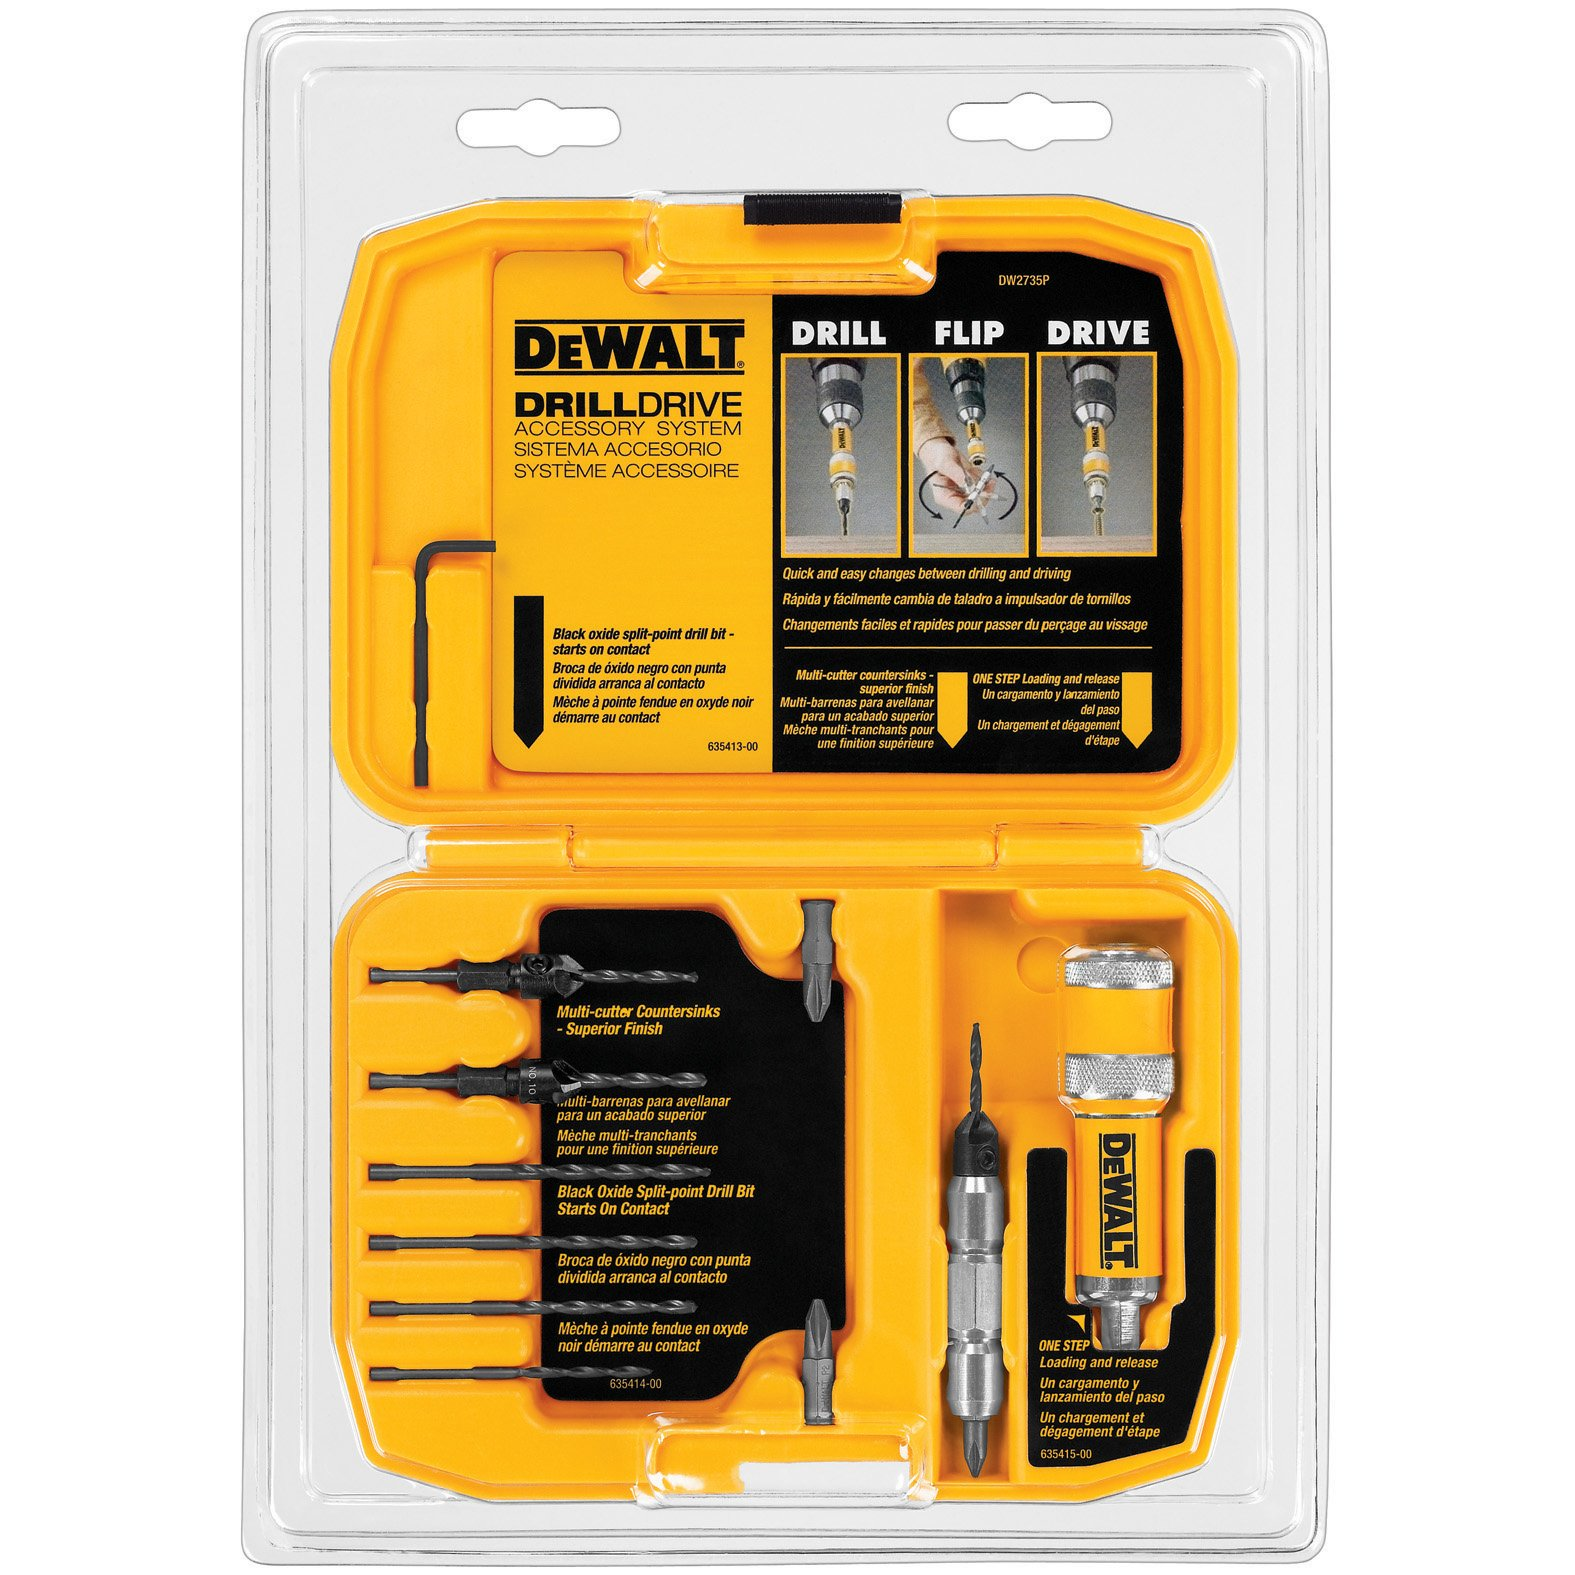 DEWALT Screwdriver Bit Set / Drill Bit Set, Flip Drive, 12-Piece (DW2735P) by DEWALT